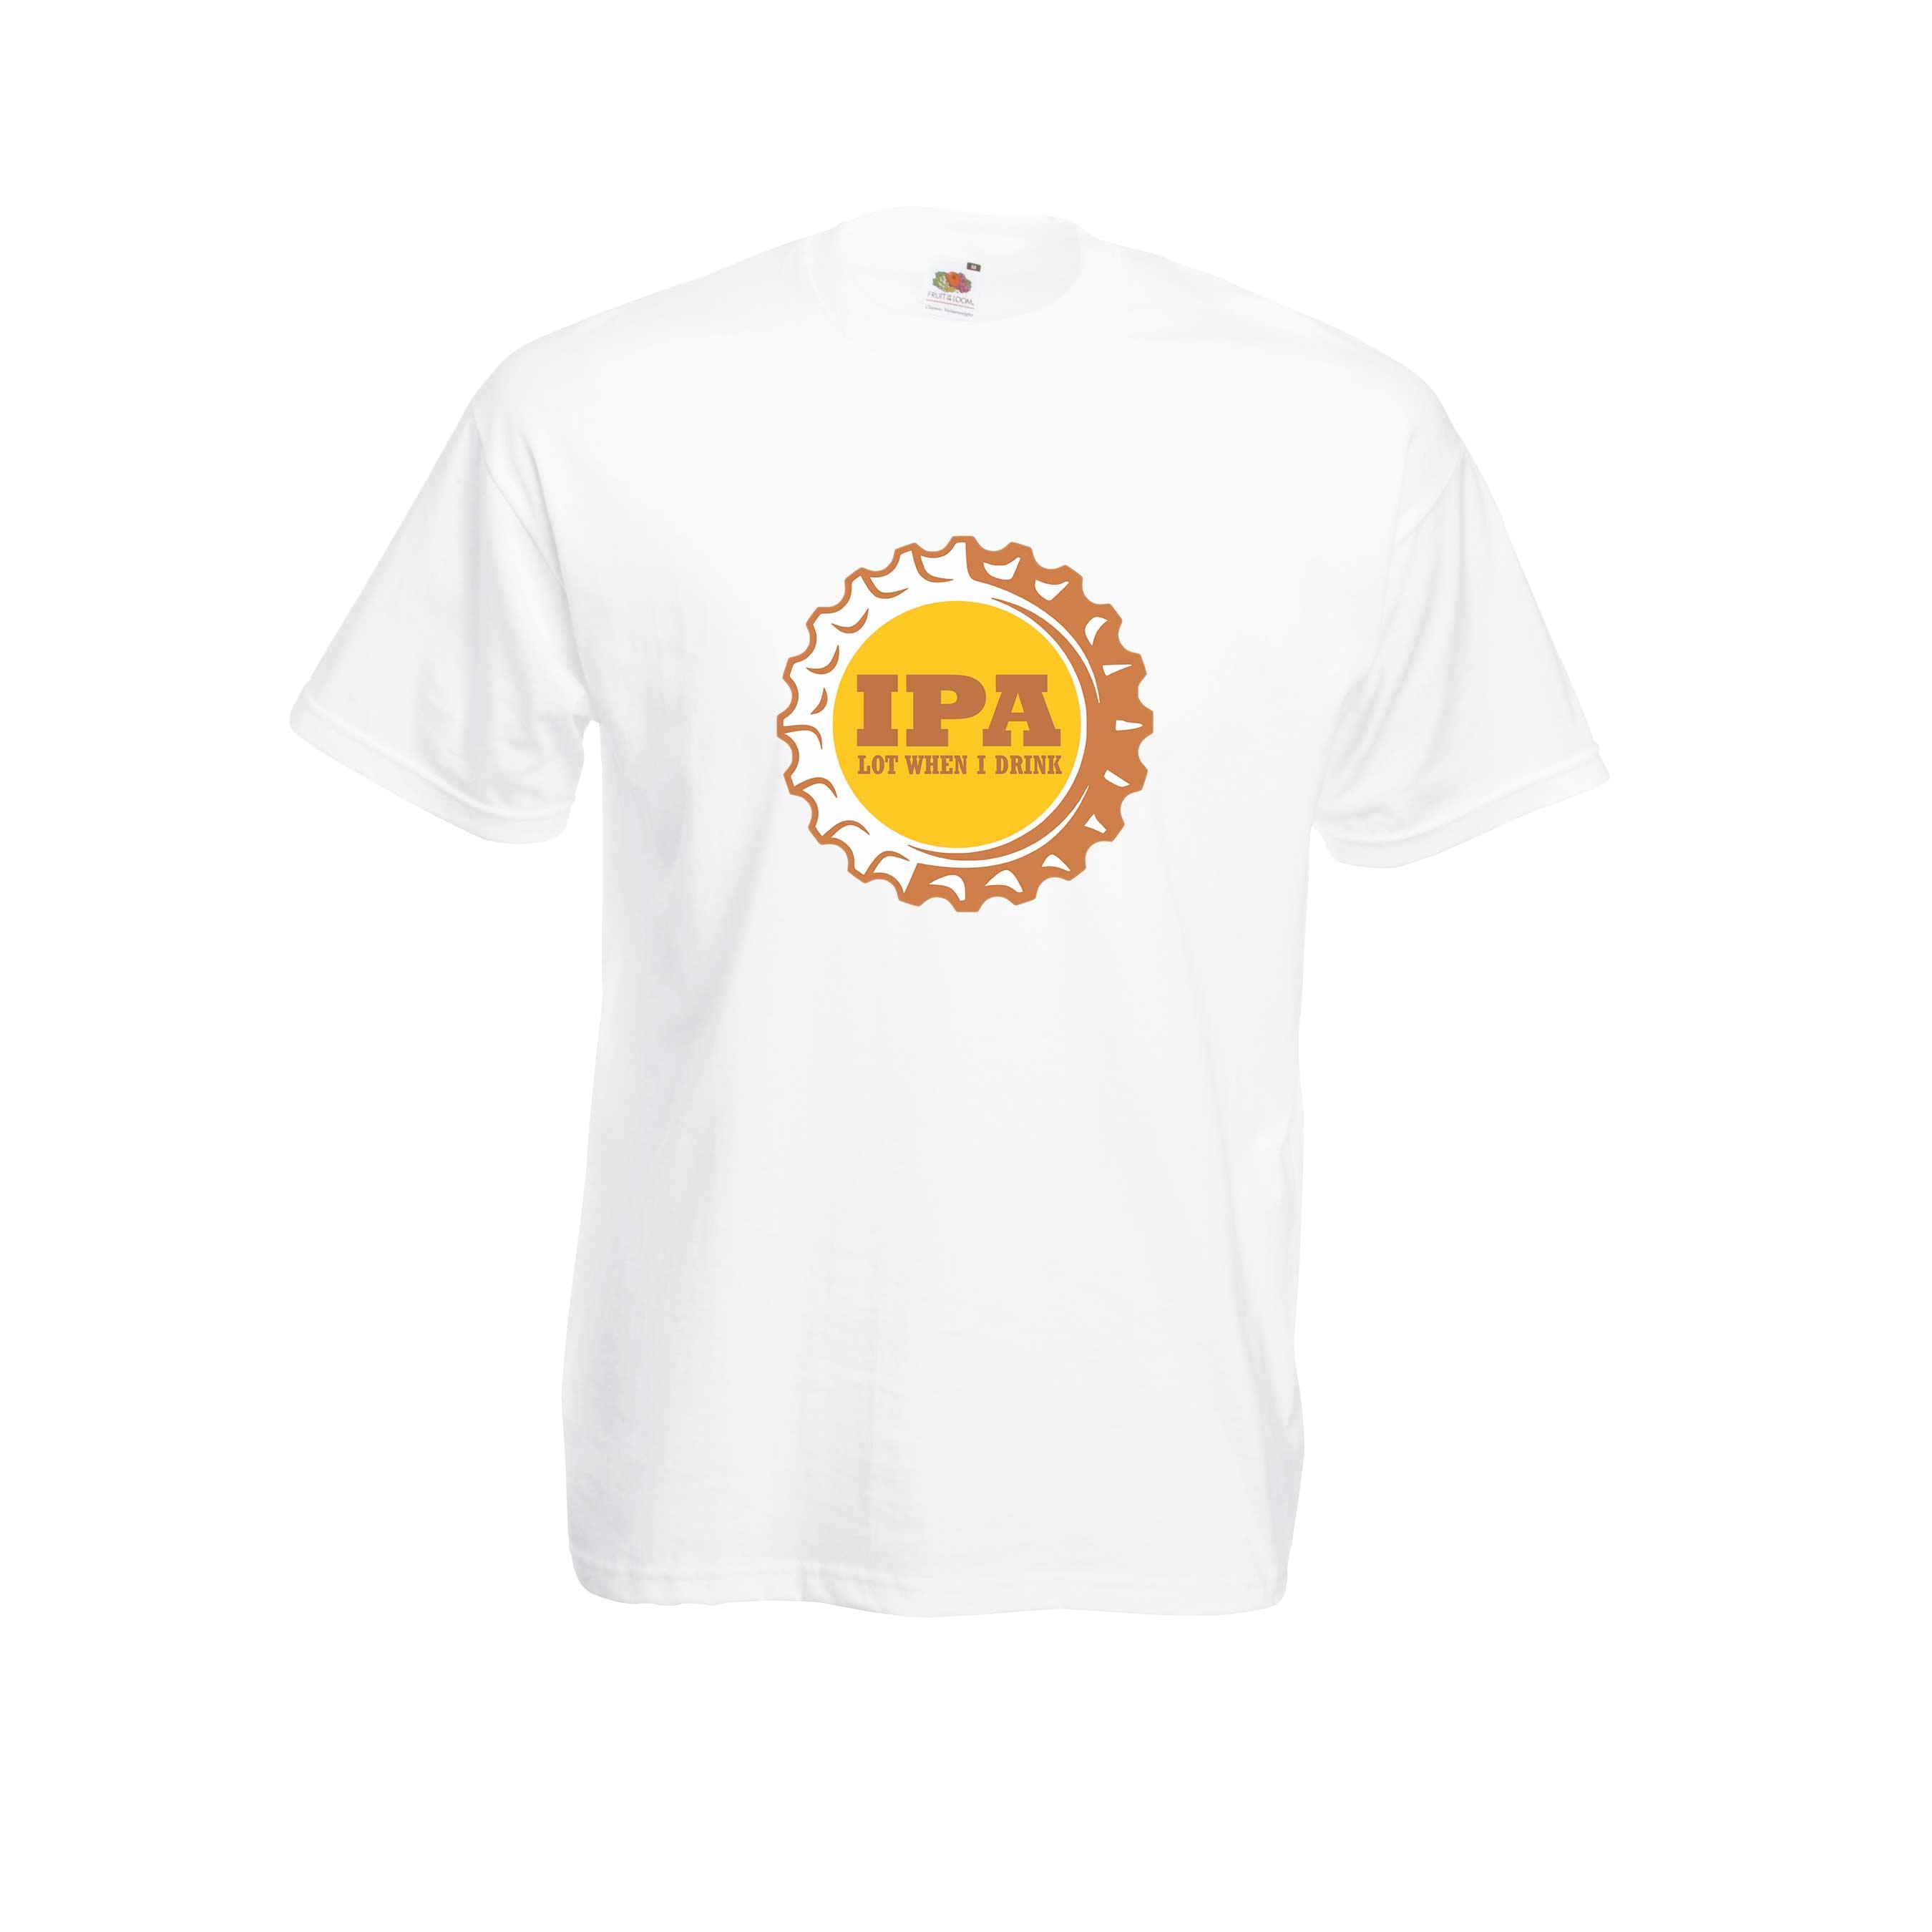 IPA design for t-shirt, hoodie & sweatshirt